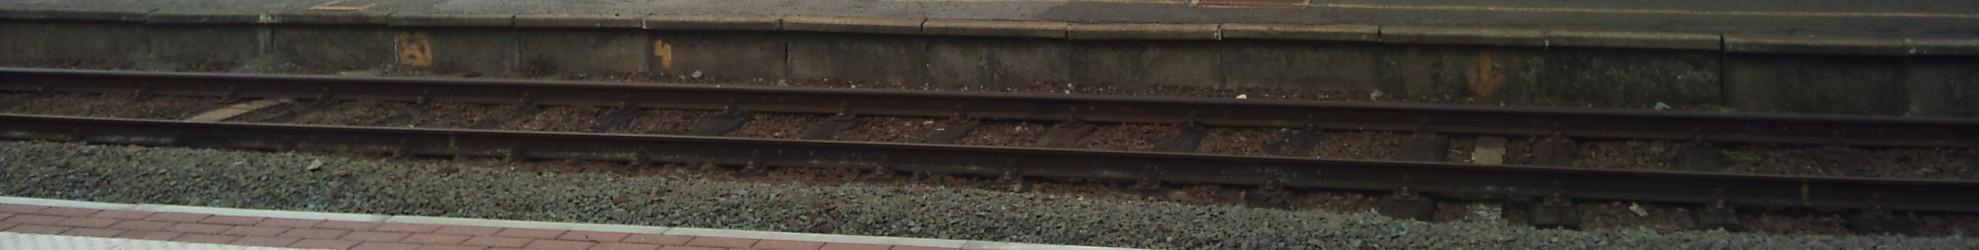 Rail-Track asbl/vzw